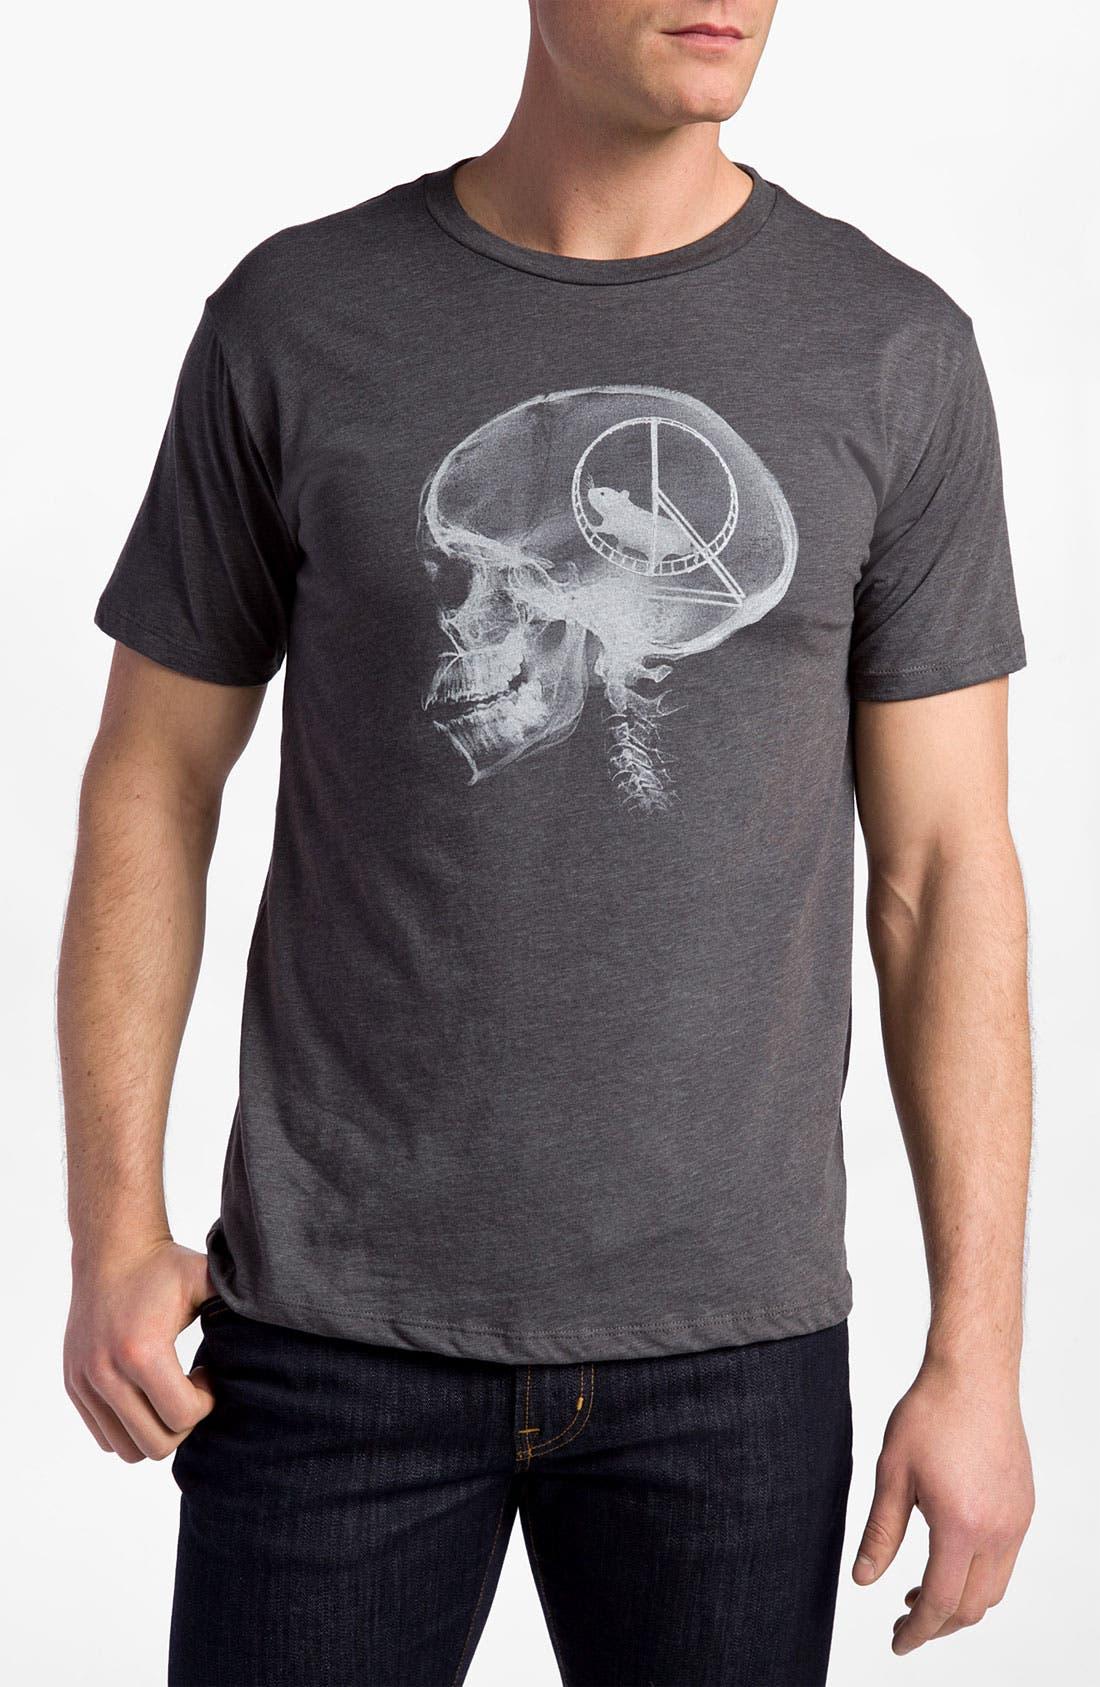 Alternate Image 1 Selected - Headline Shirts 'Hamster Head Scan' T-Shirt